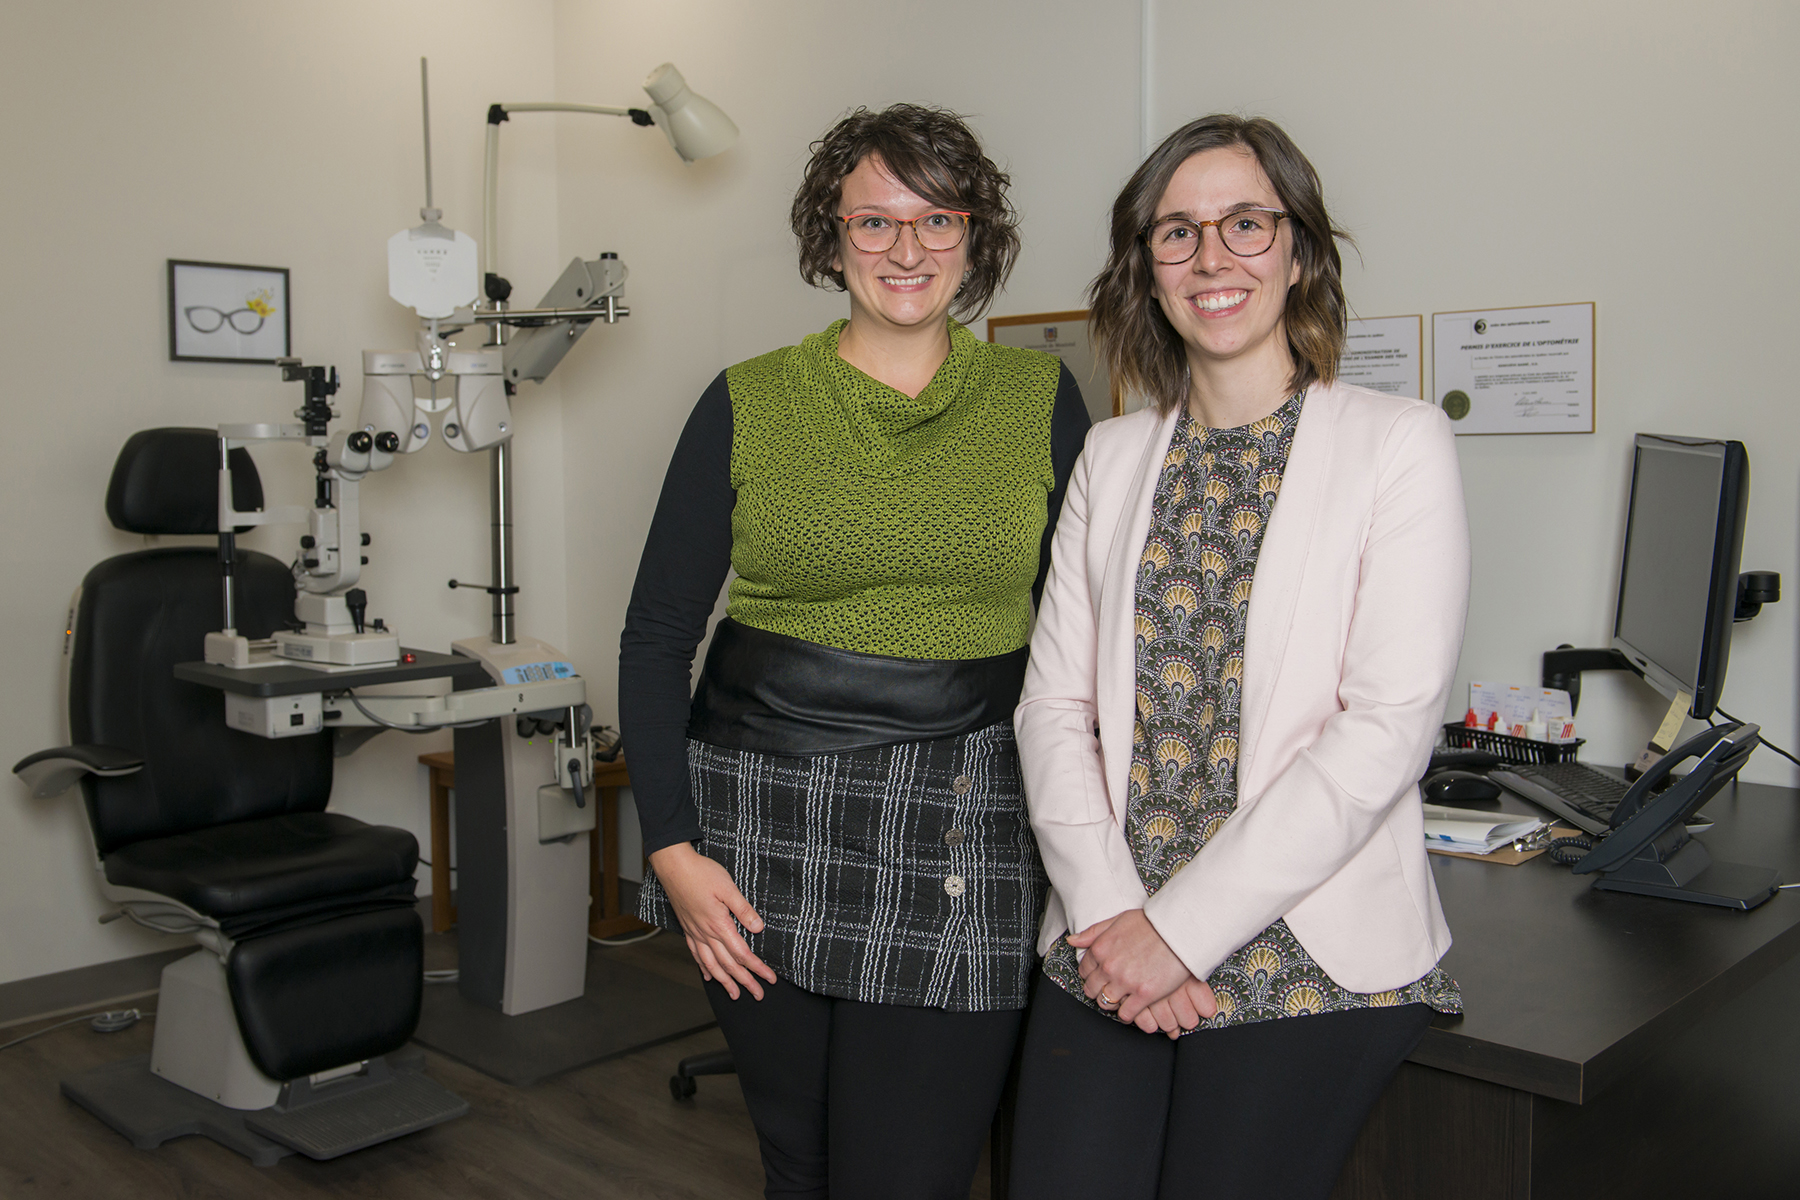 Geneviève et Sarah-Ève, optométriste